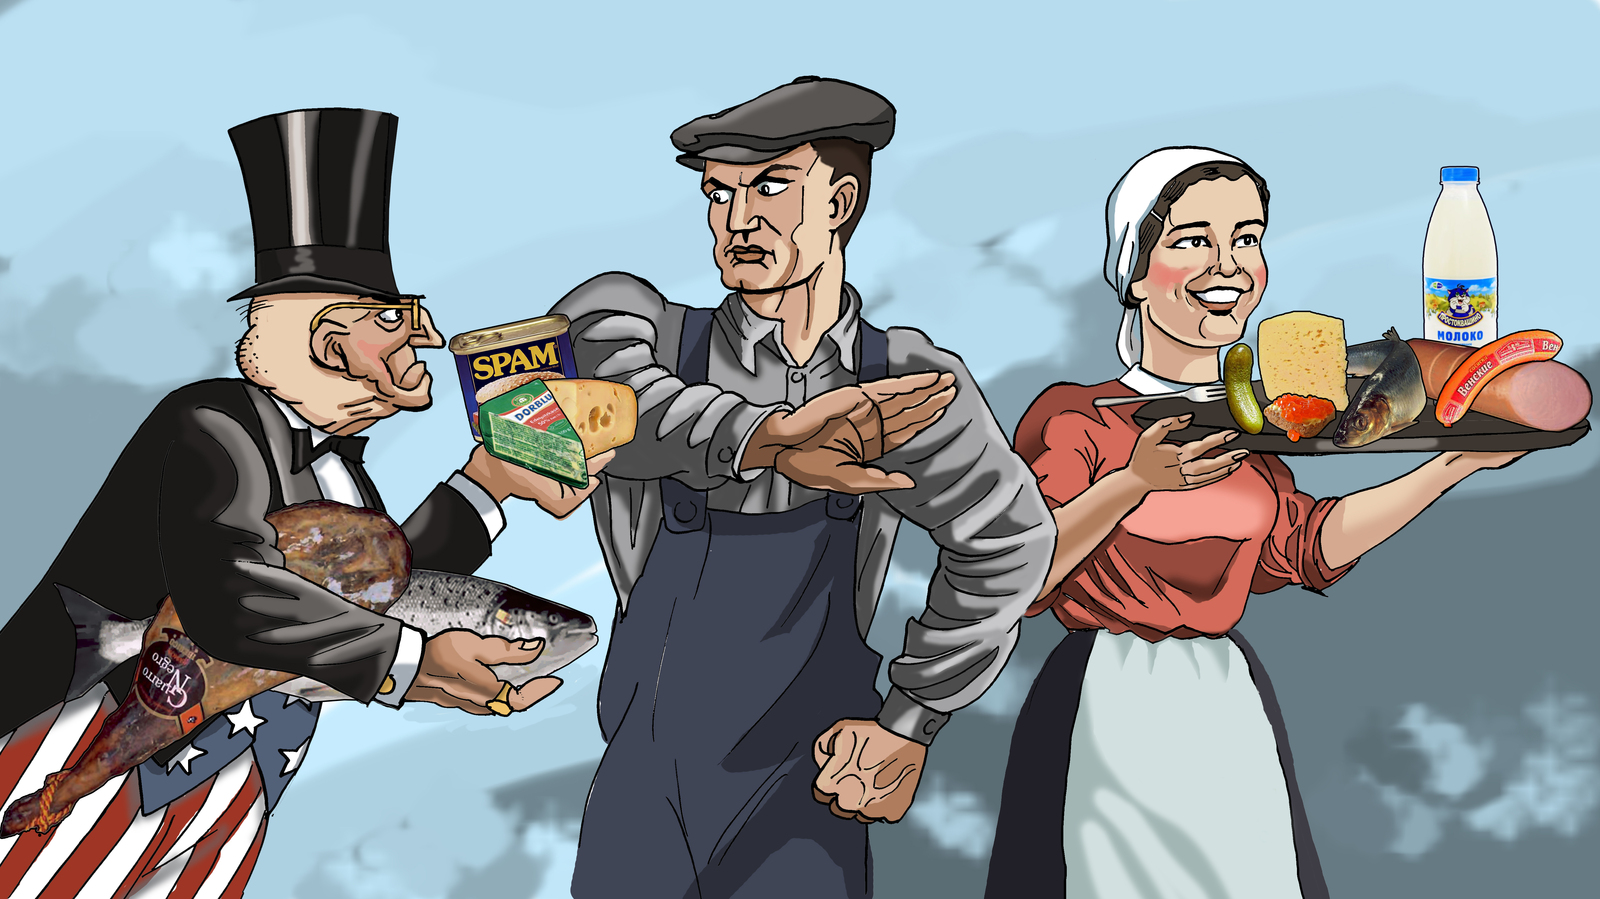 сша и санкции юмор картинки кавказе